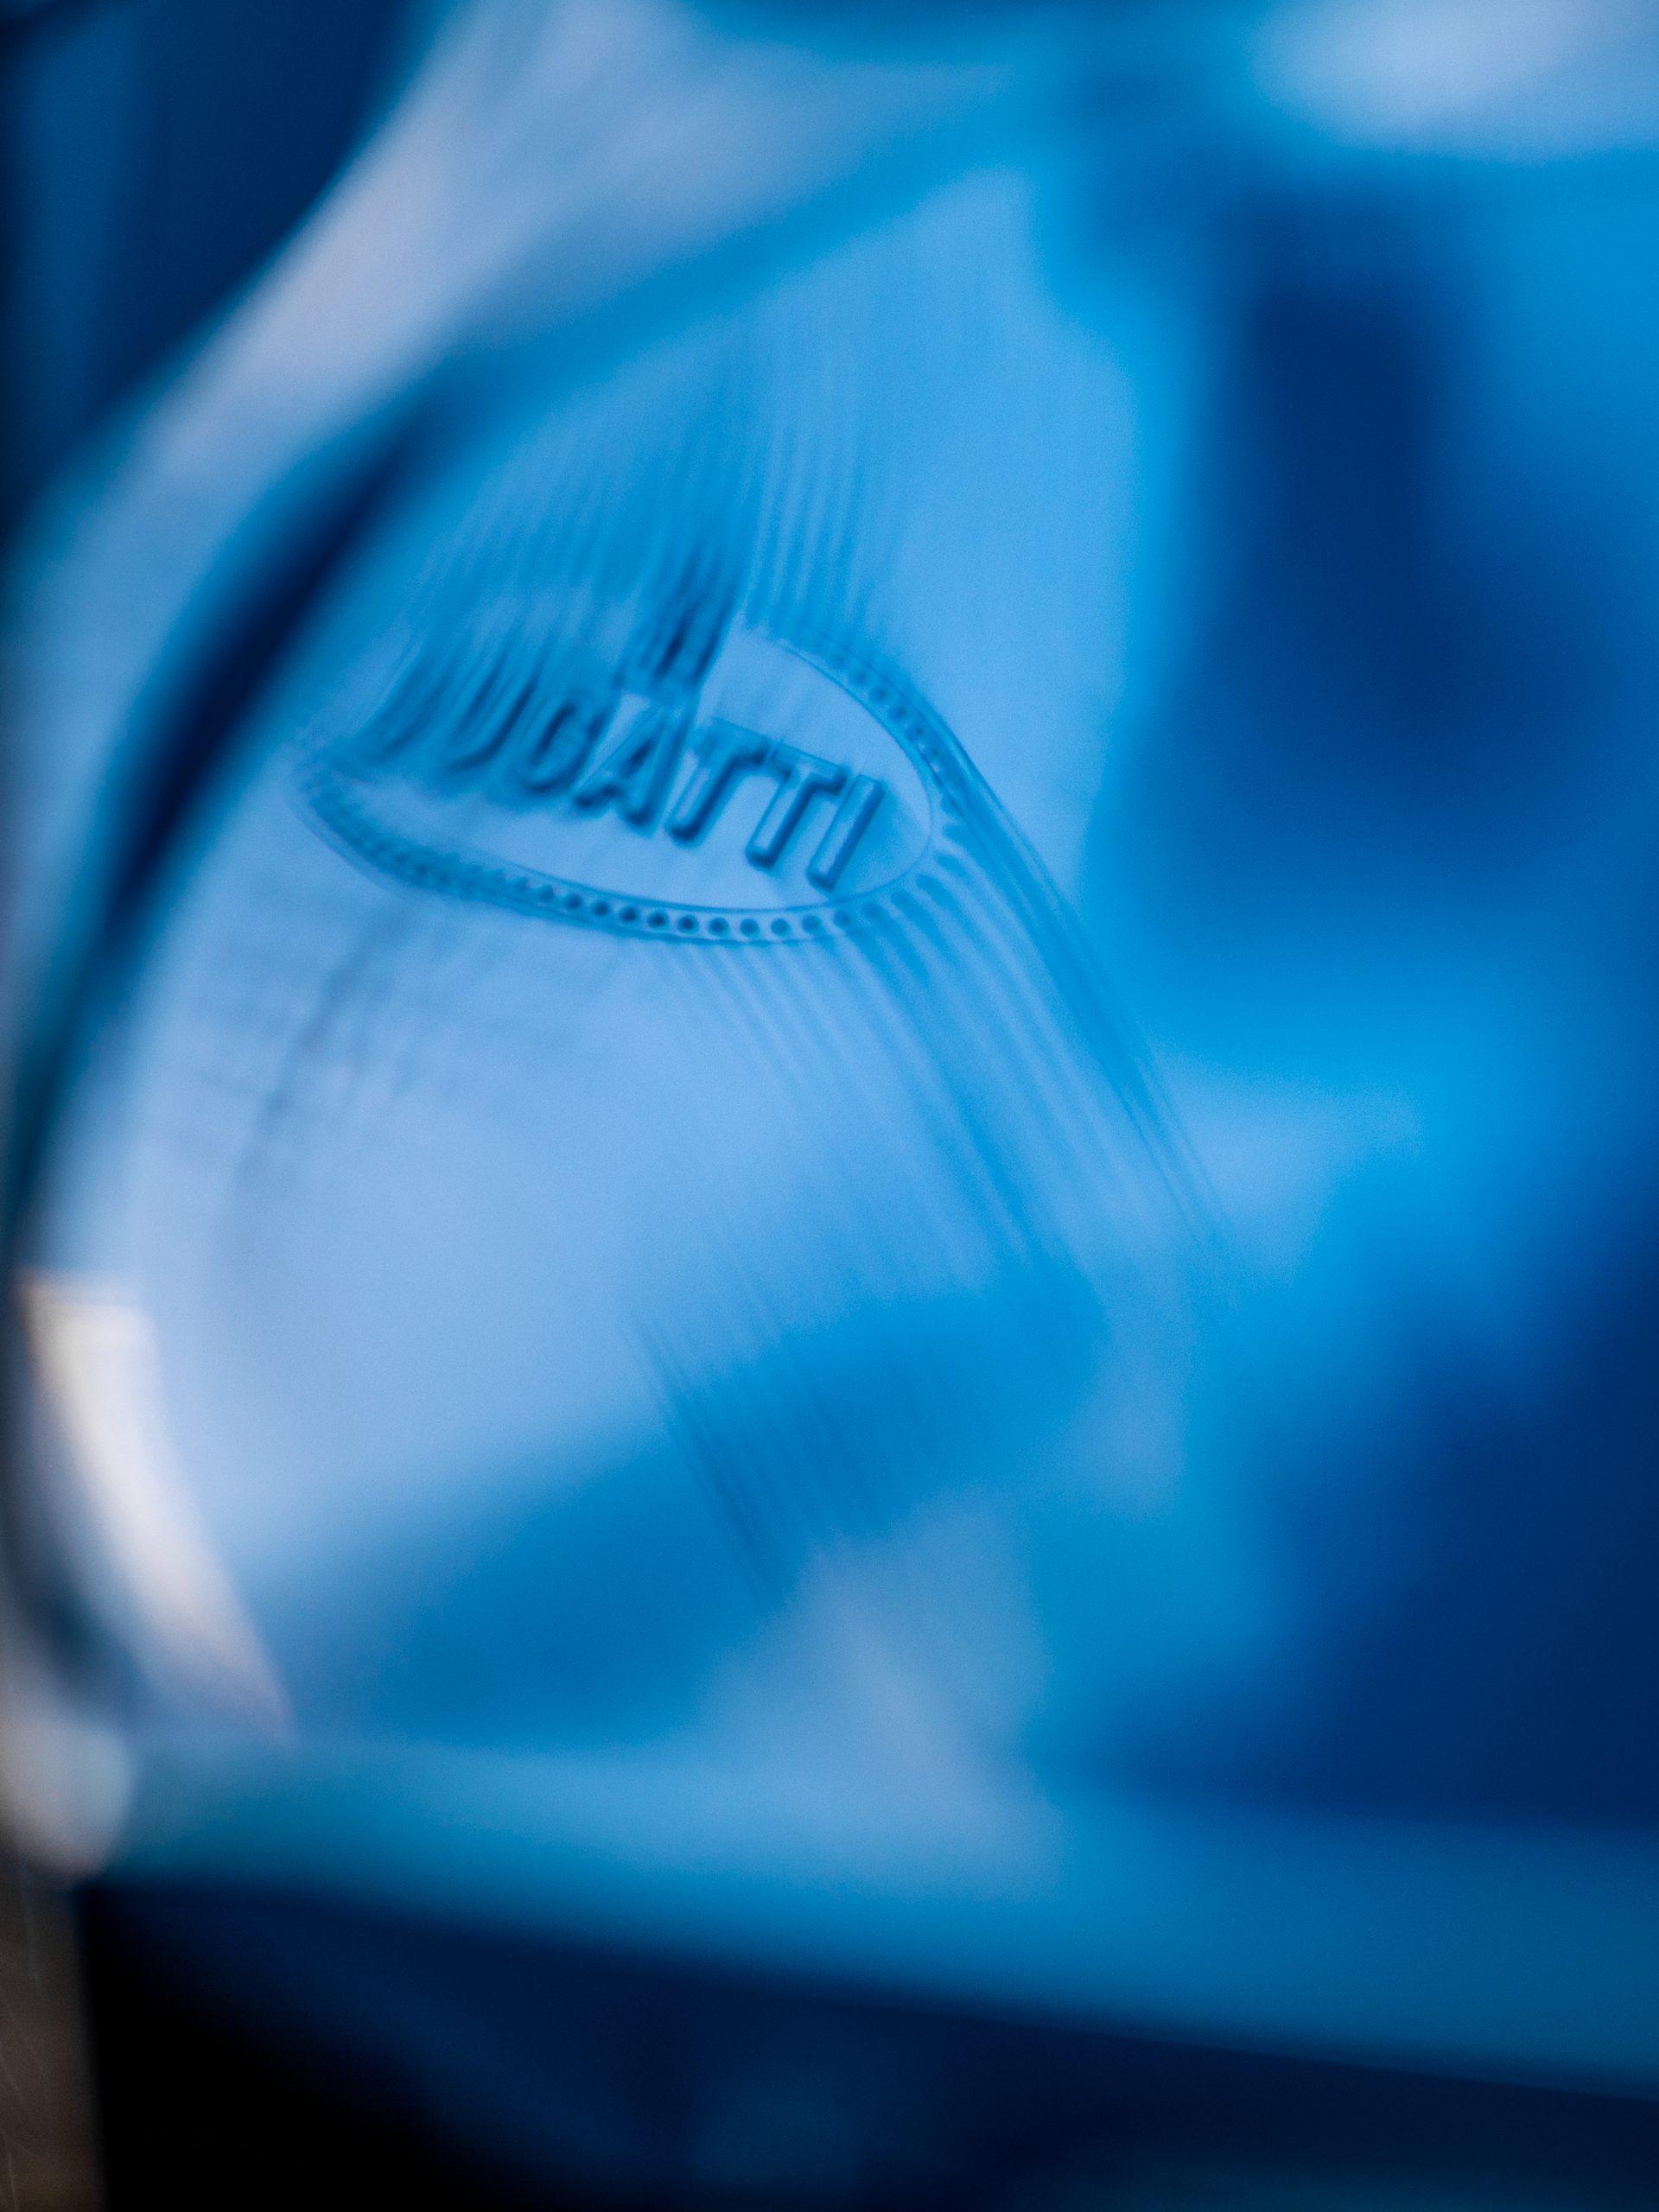 Bugatti-Chiron-Pur-Sport-show-car-5